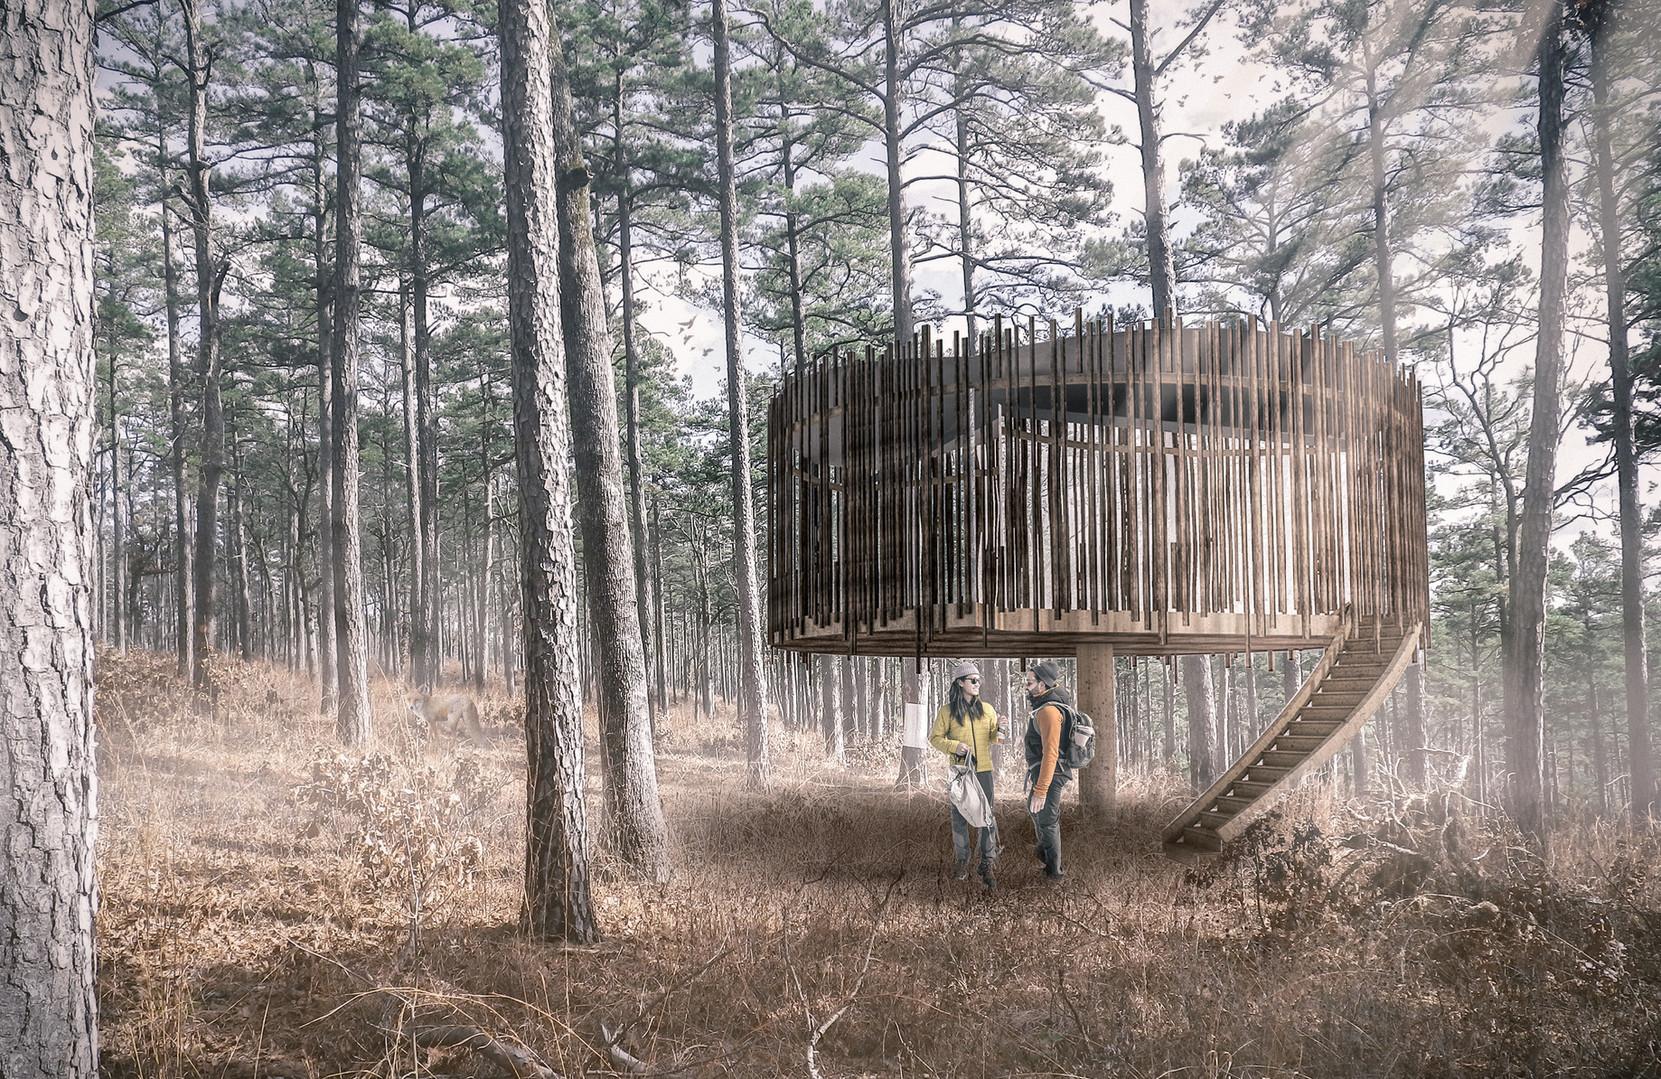 Castan treehouse in Welsh woodland